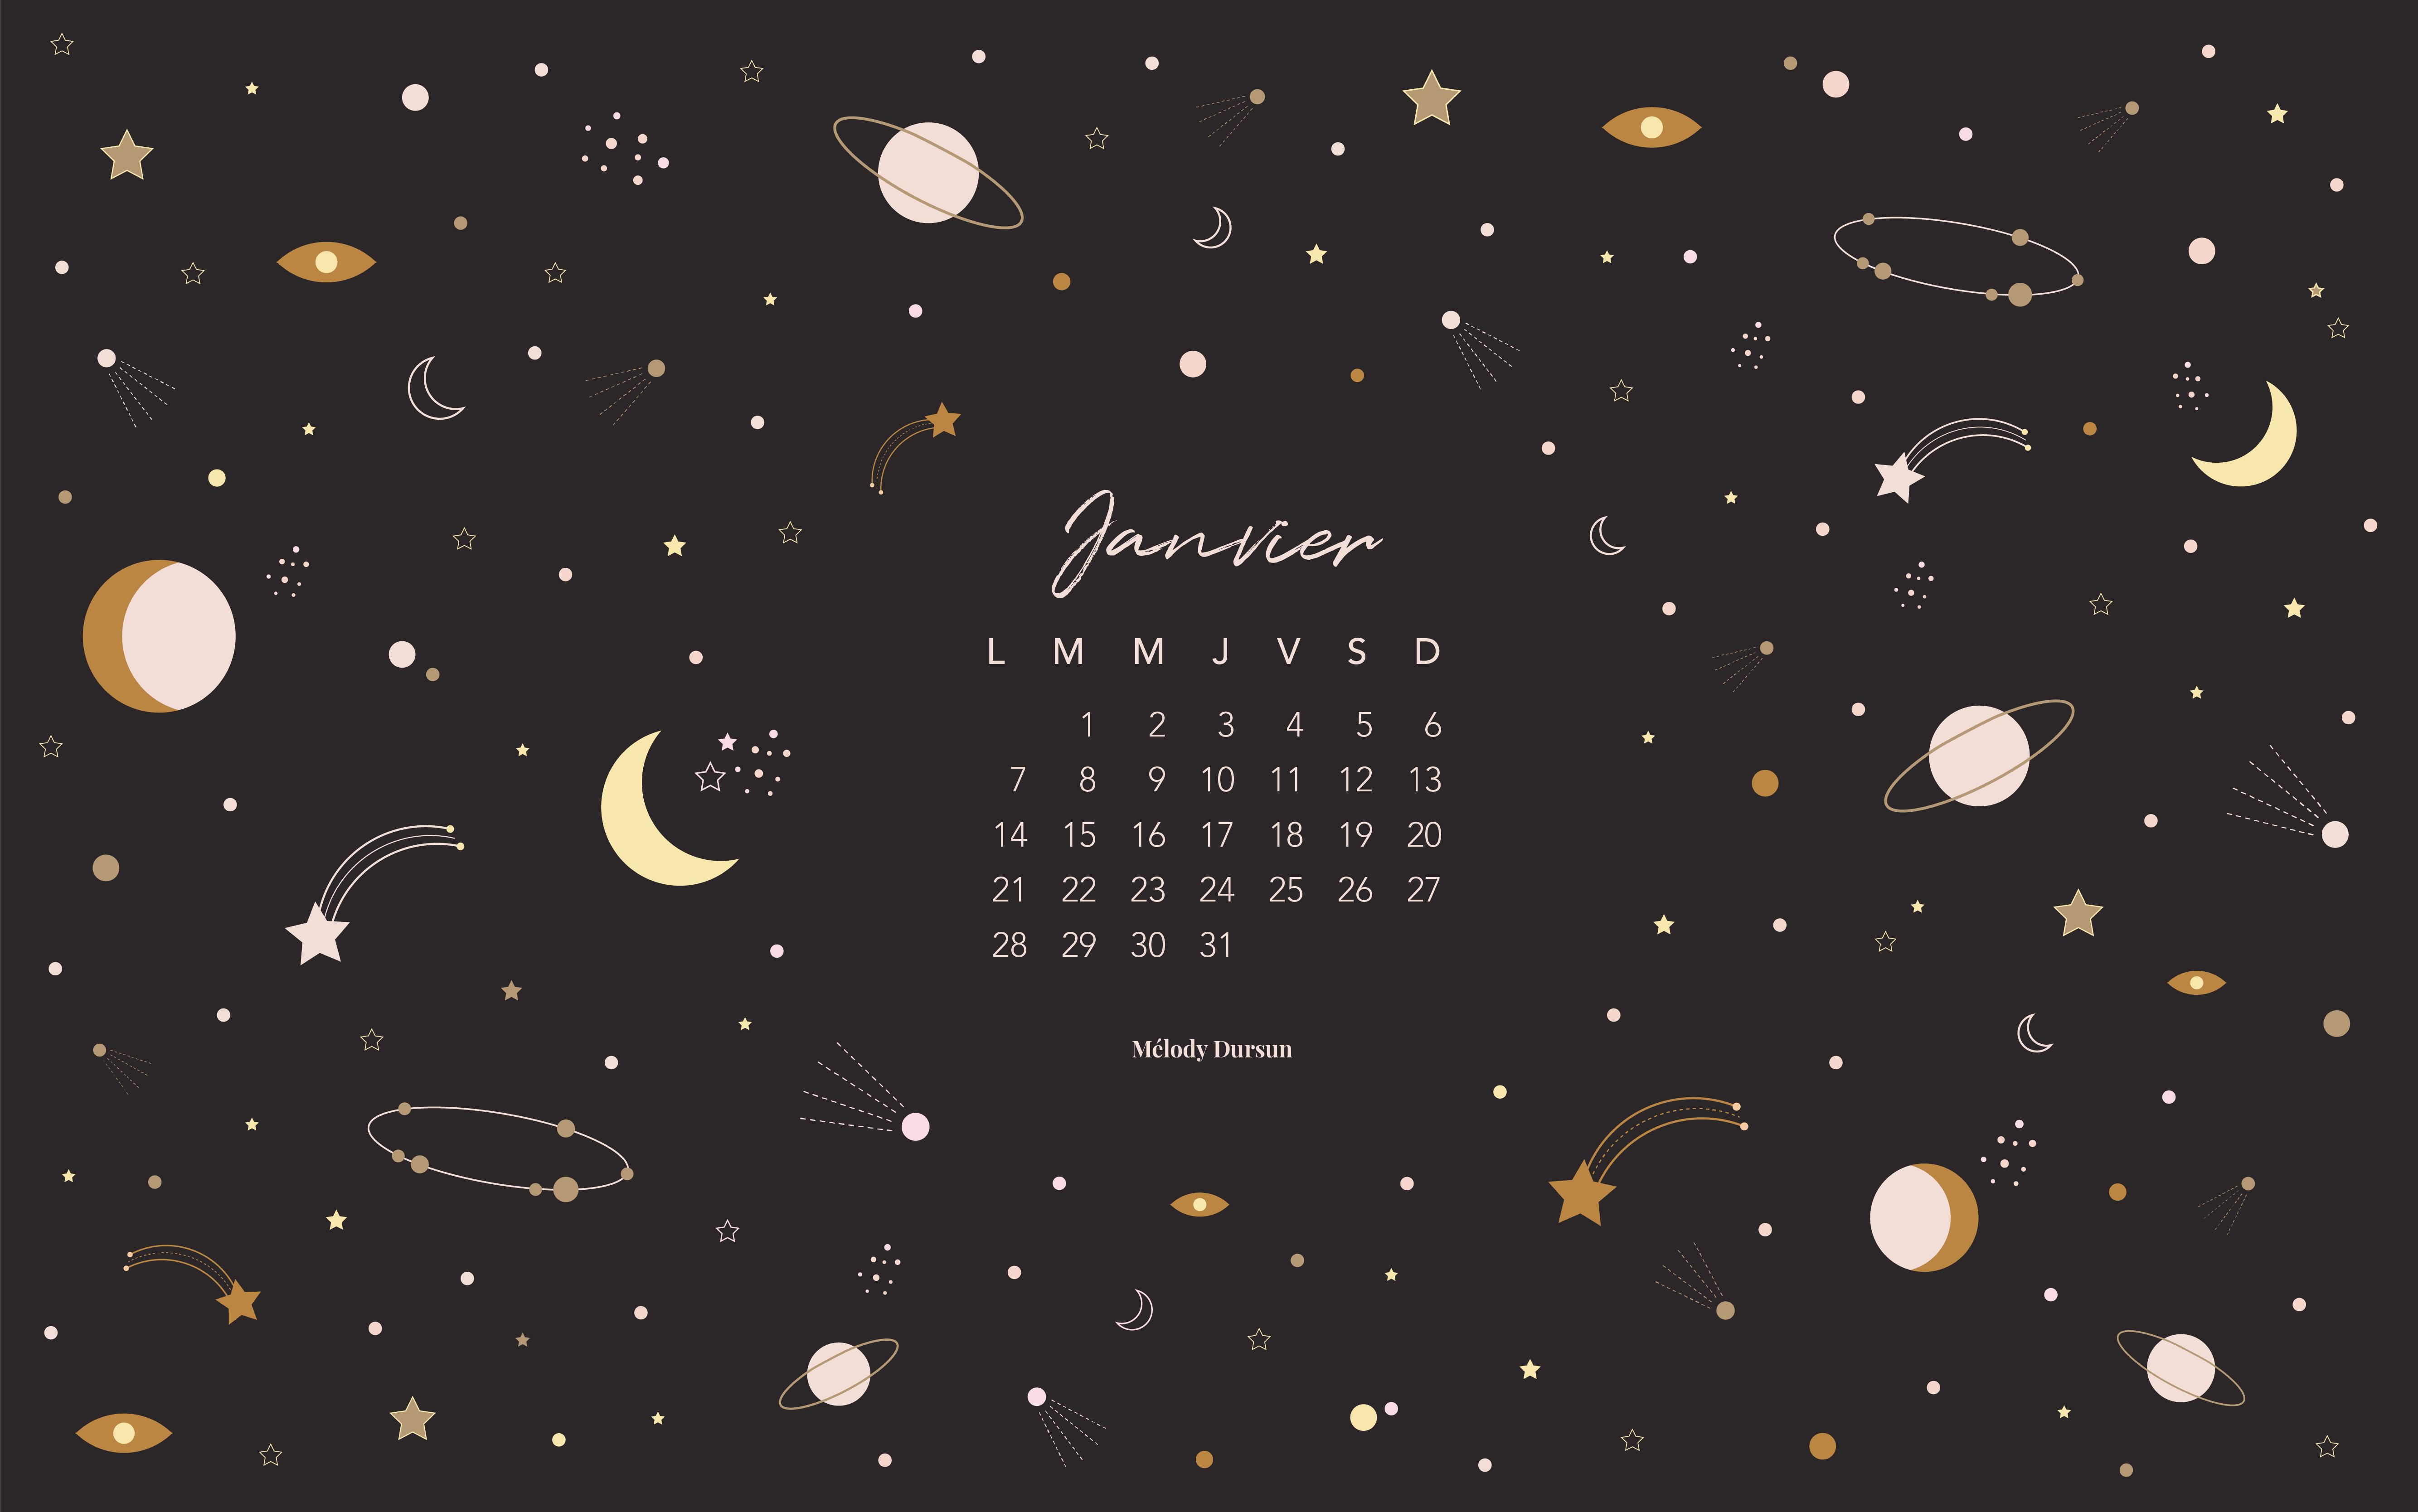 melodydursun-calendrier-janvier2019-black-1